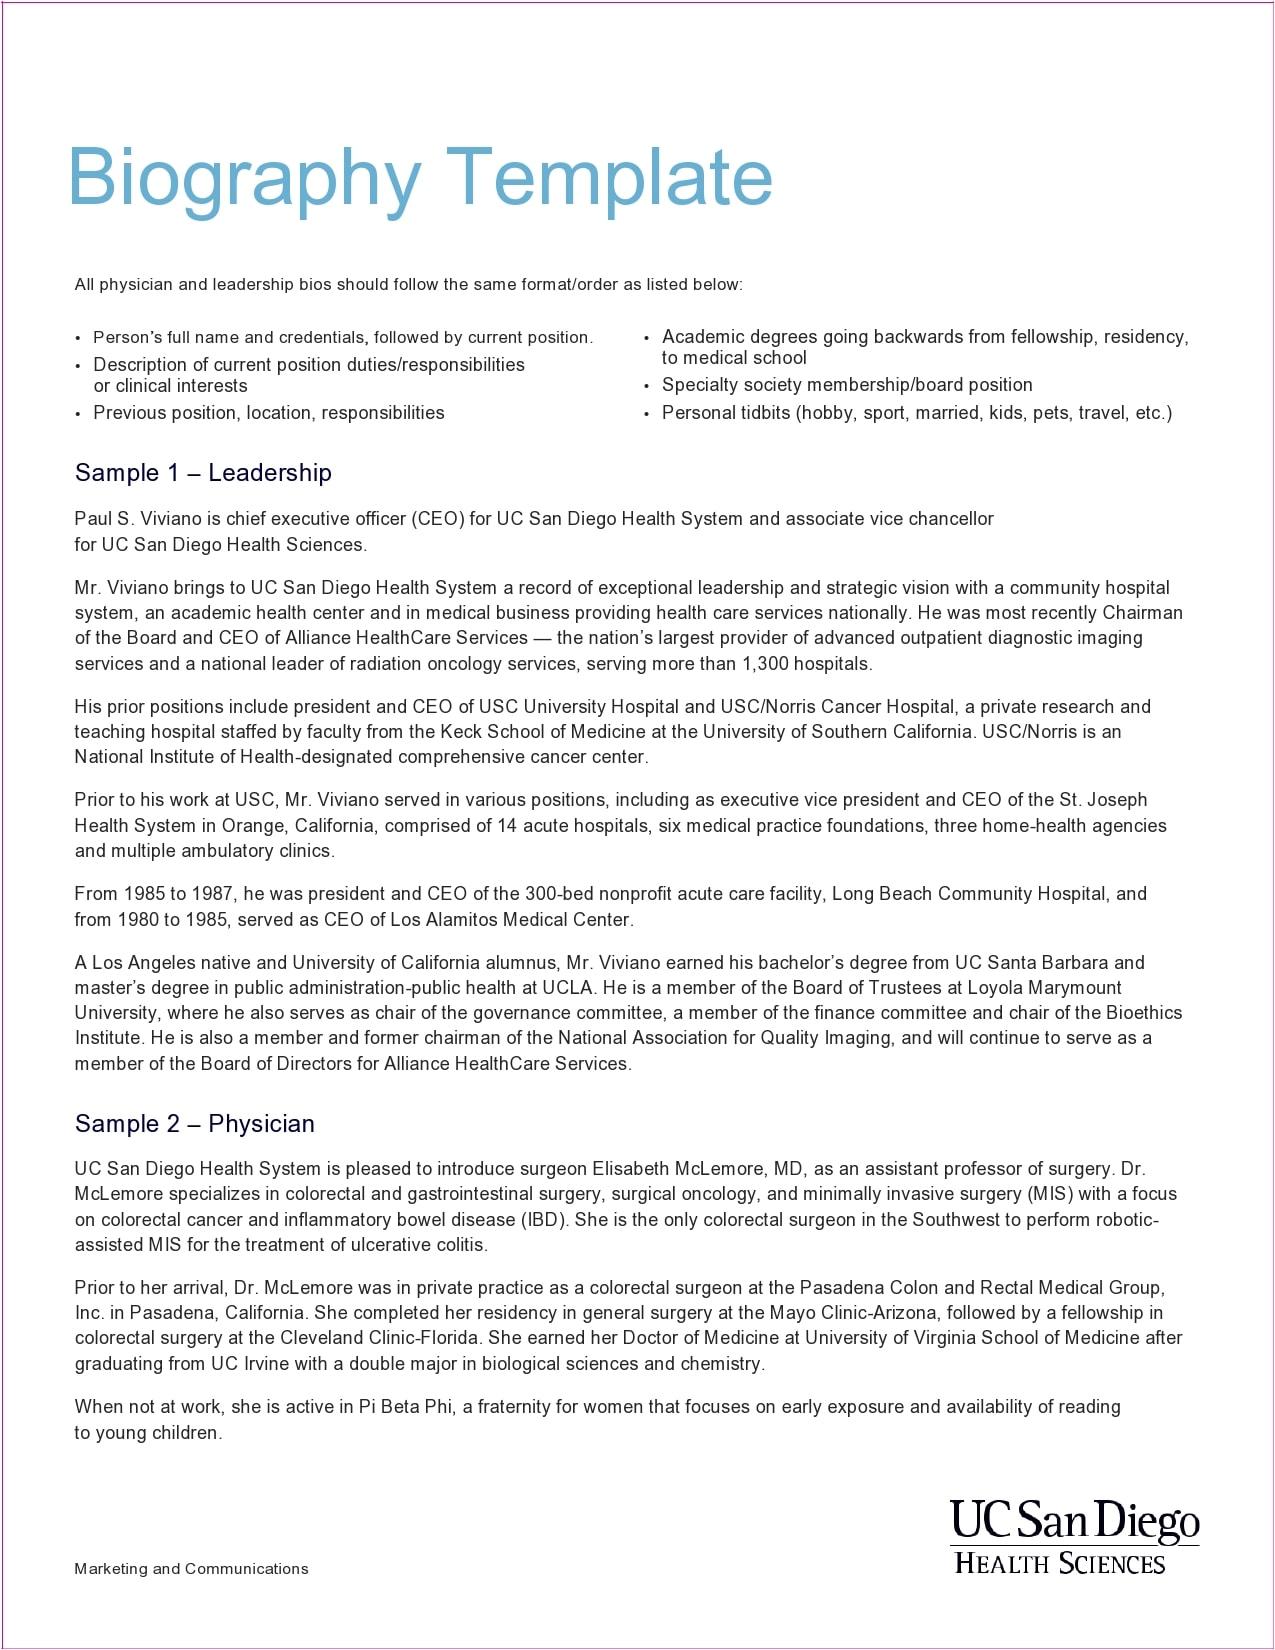 A bio template writing 38+ Biography